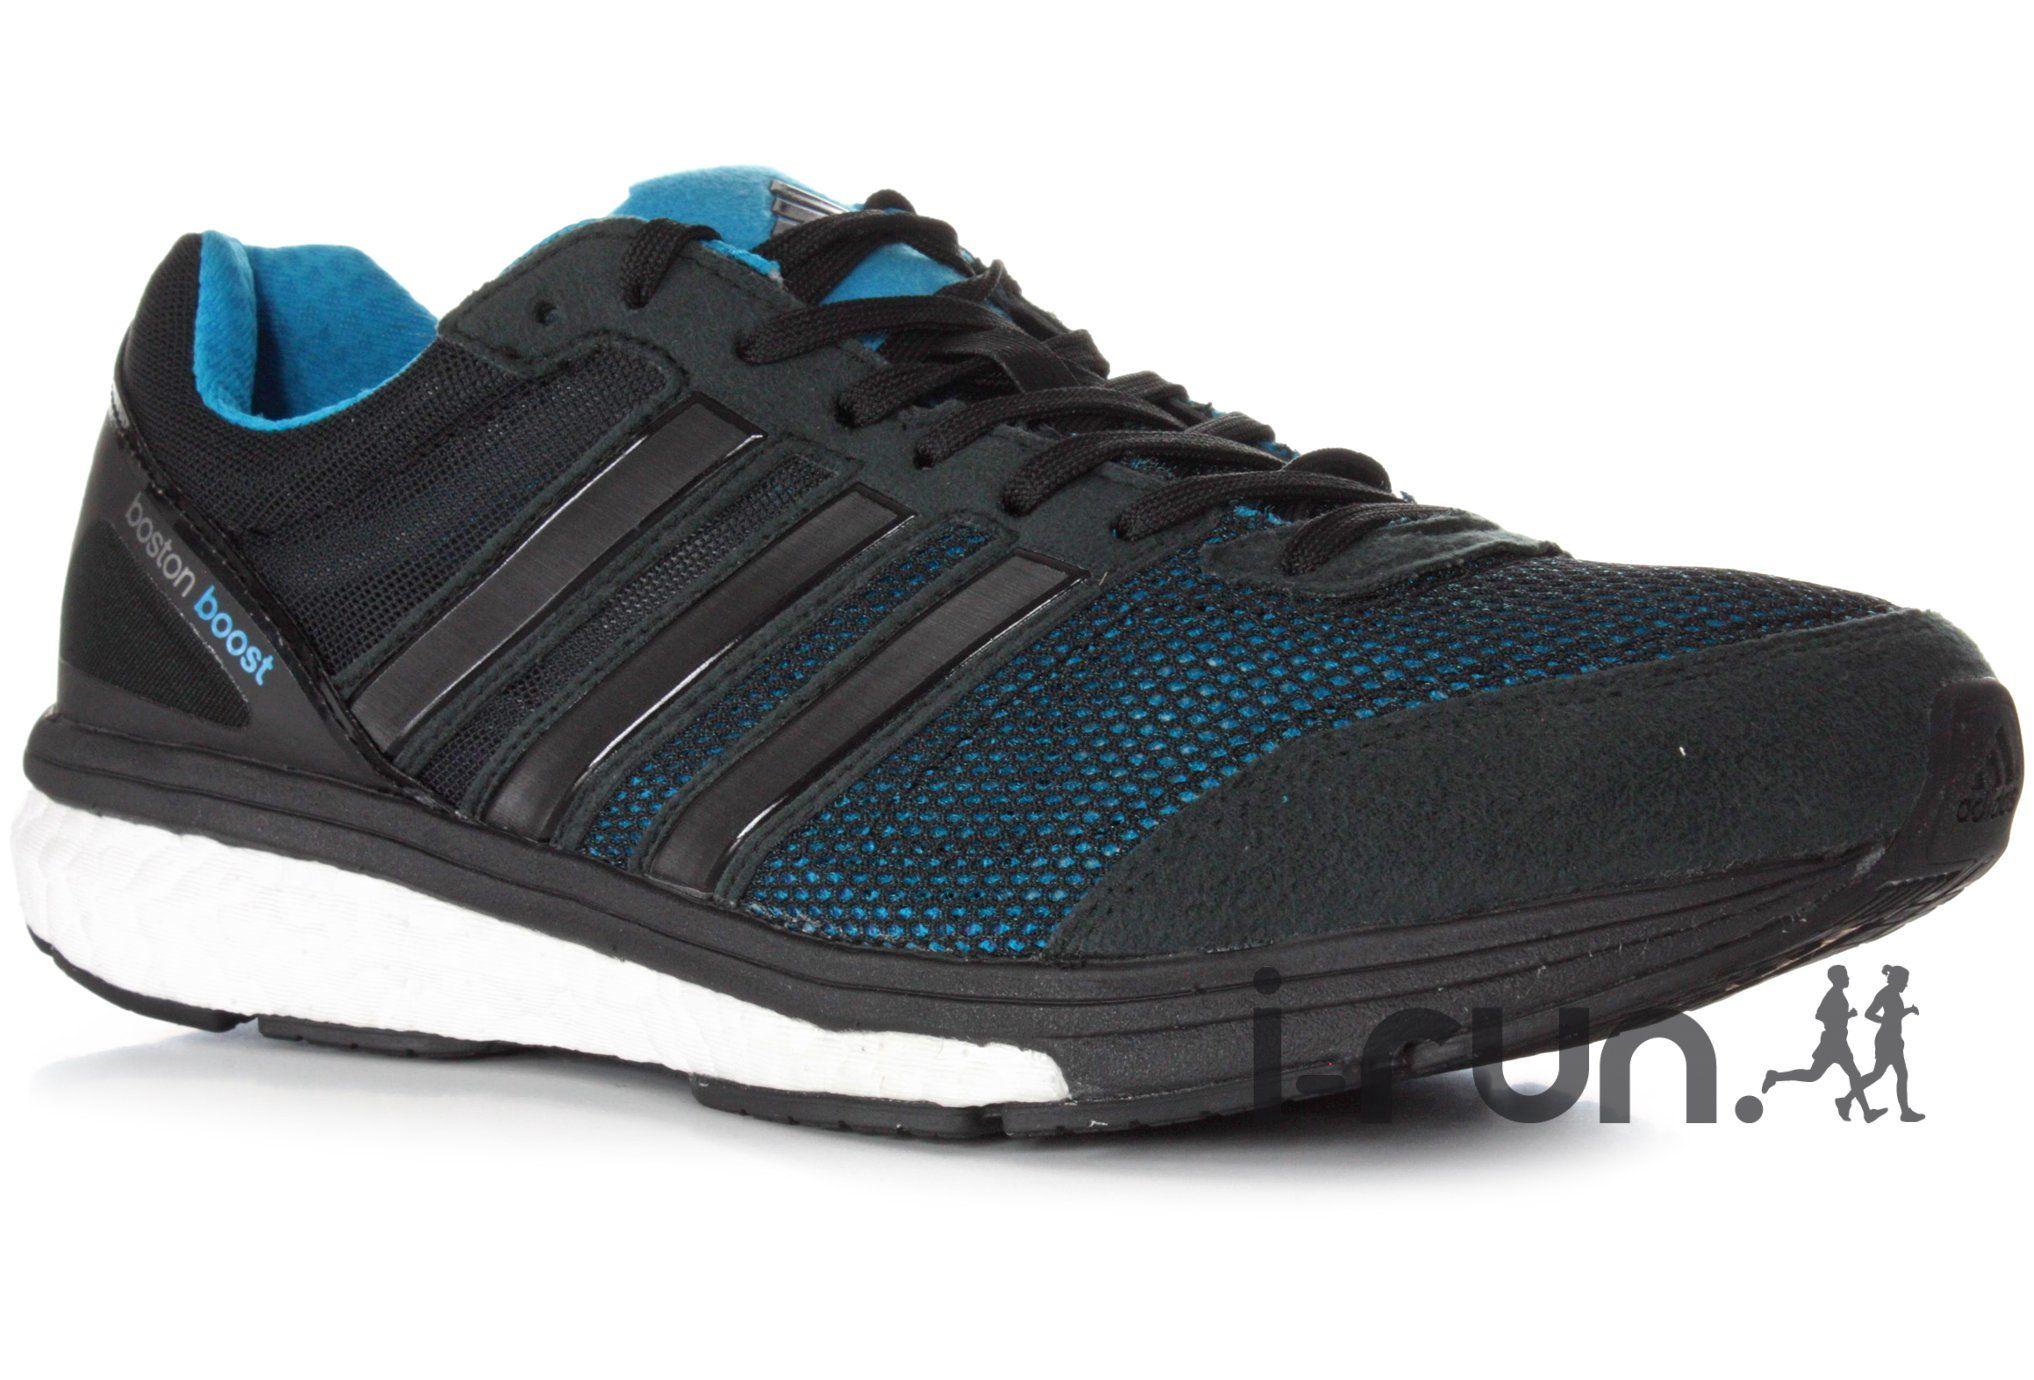 Boston Qctnzwq4 Boost Adidas Adizero M 5 Destockage Homme Chaussures wcAPqvU0